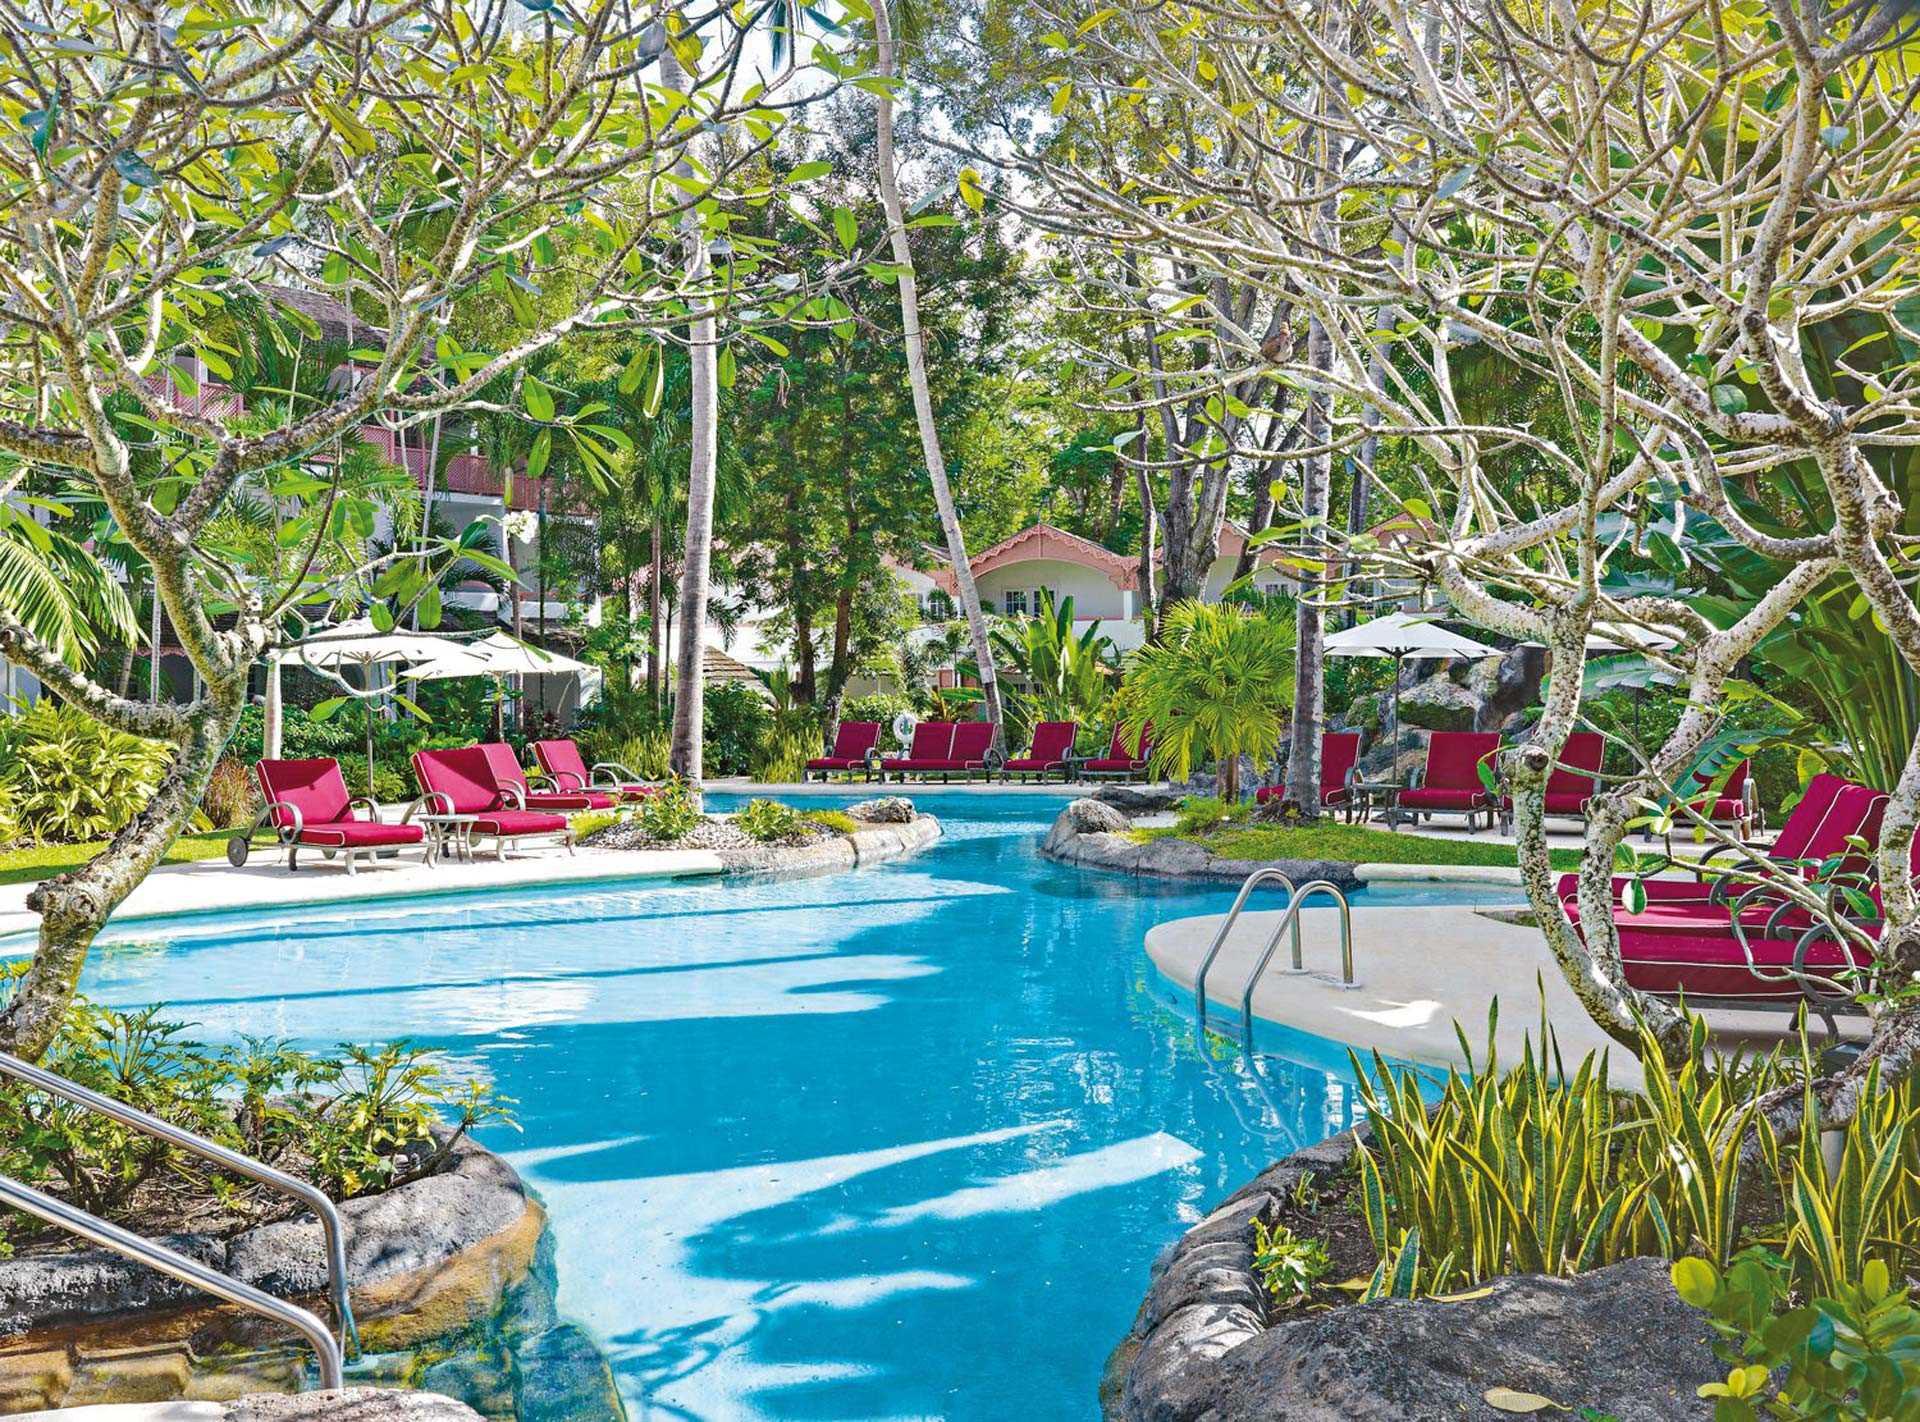 Colony Club Pool mit Liegen